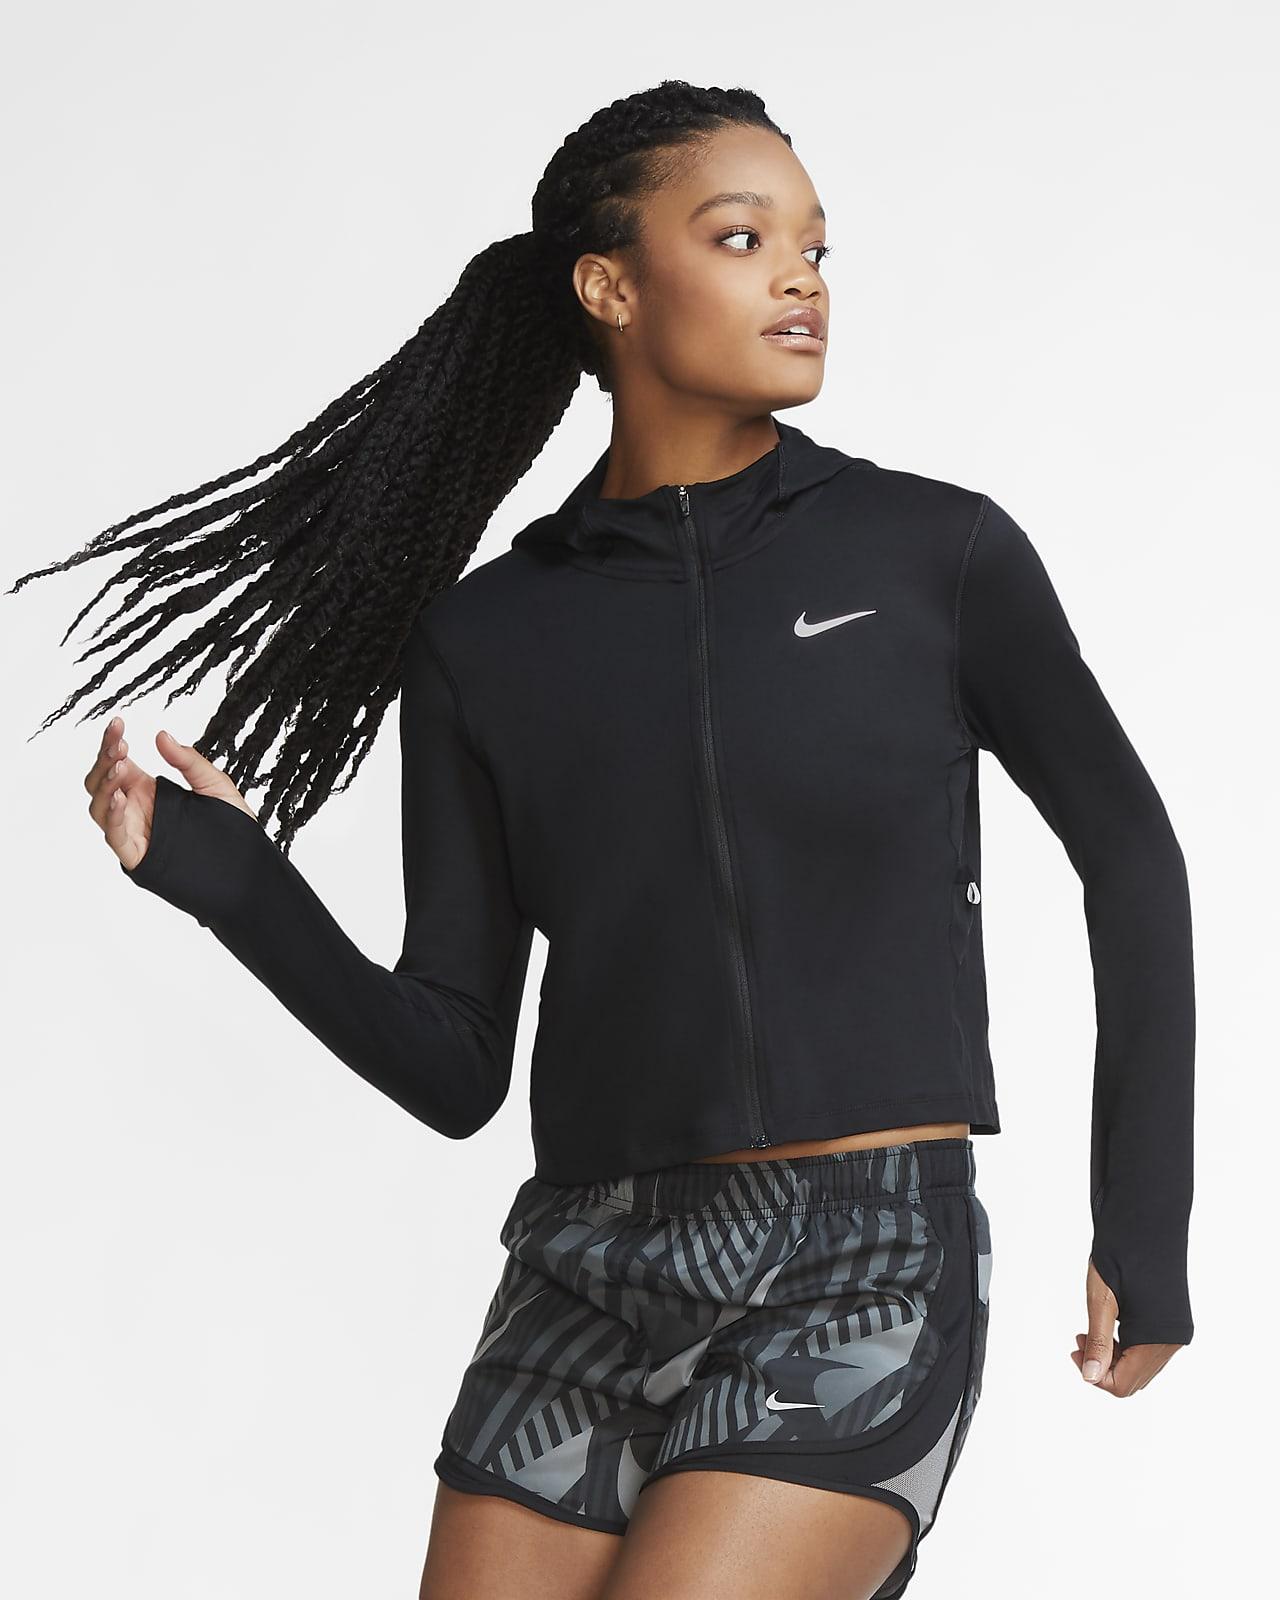 Nike Element Women's Full-Zip Running Top